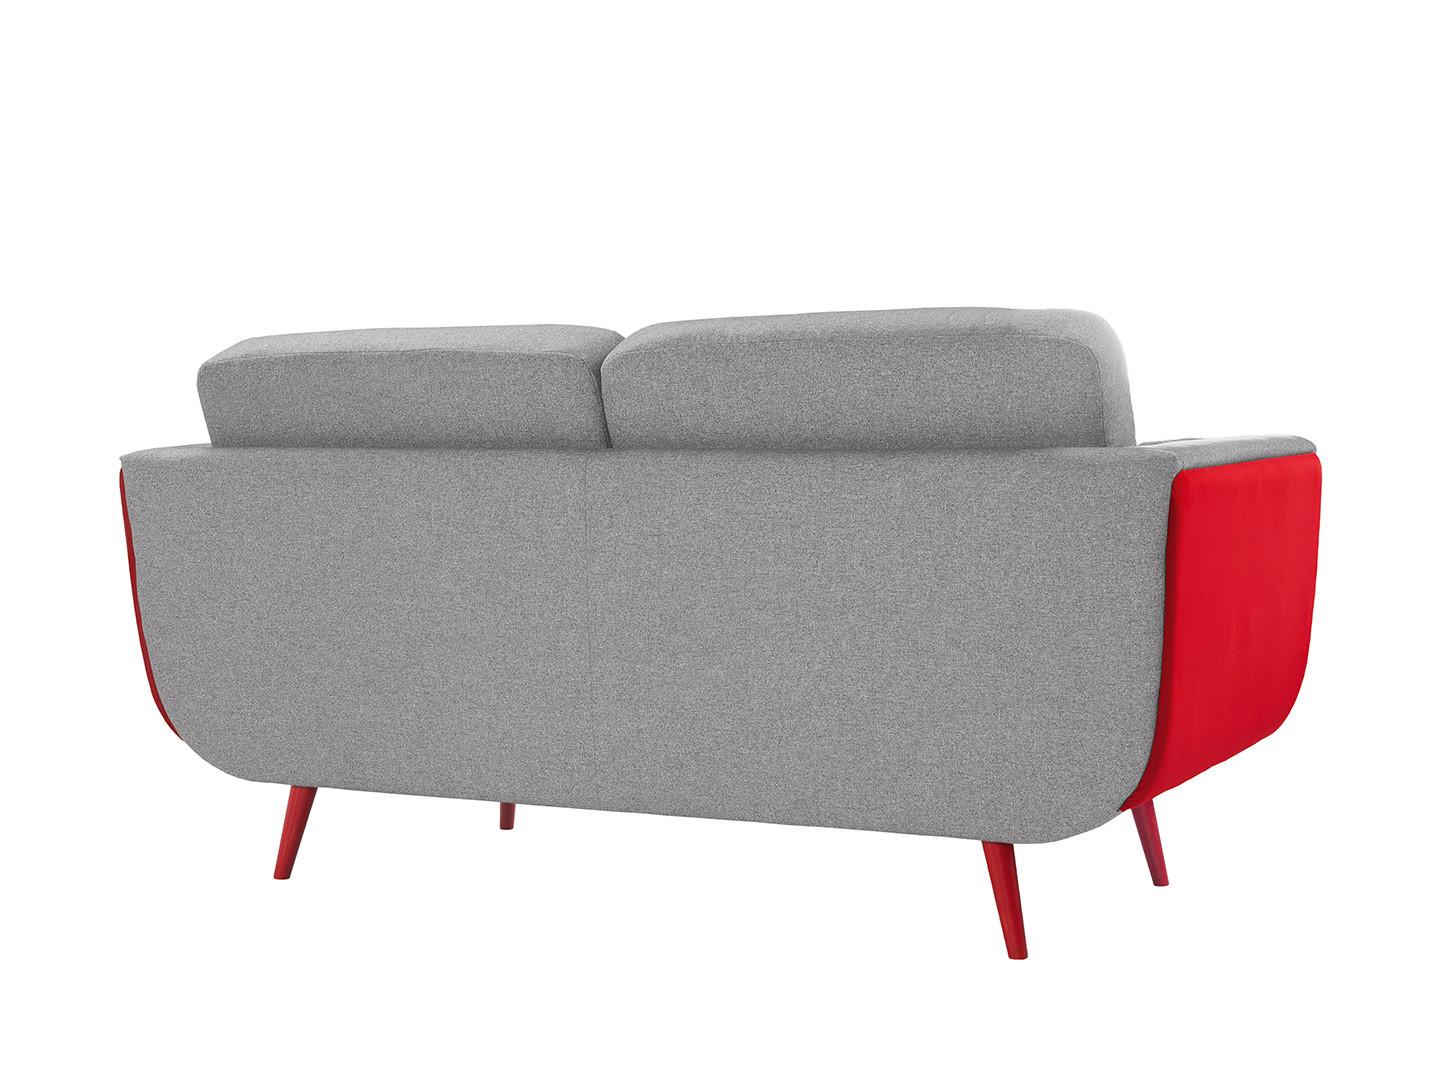 red sofa cafe baku modern colors possi light 3s 178cm x 87cm  salon meblowy brw